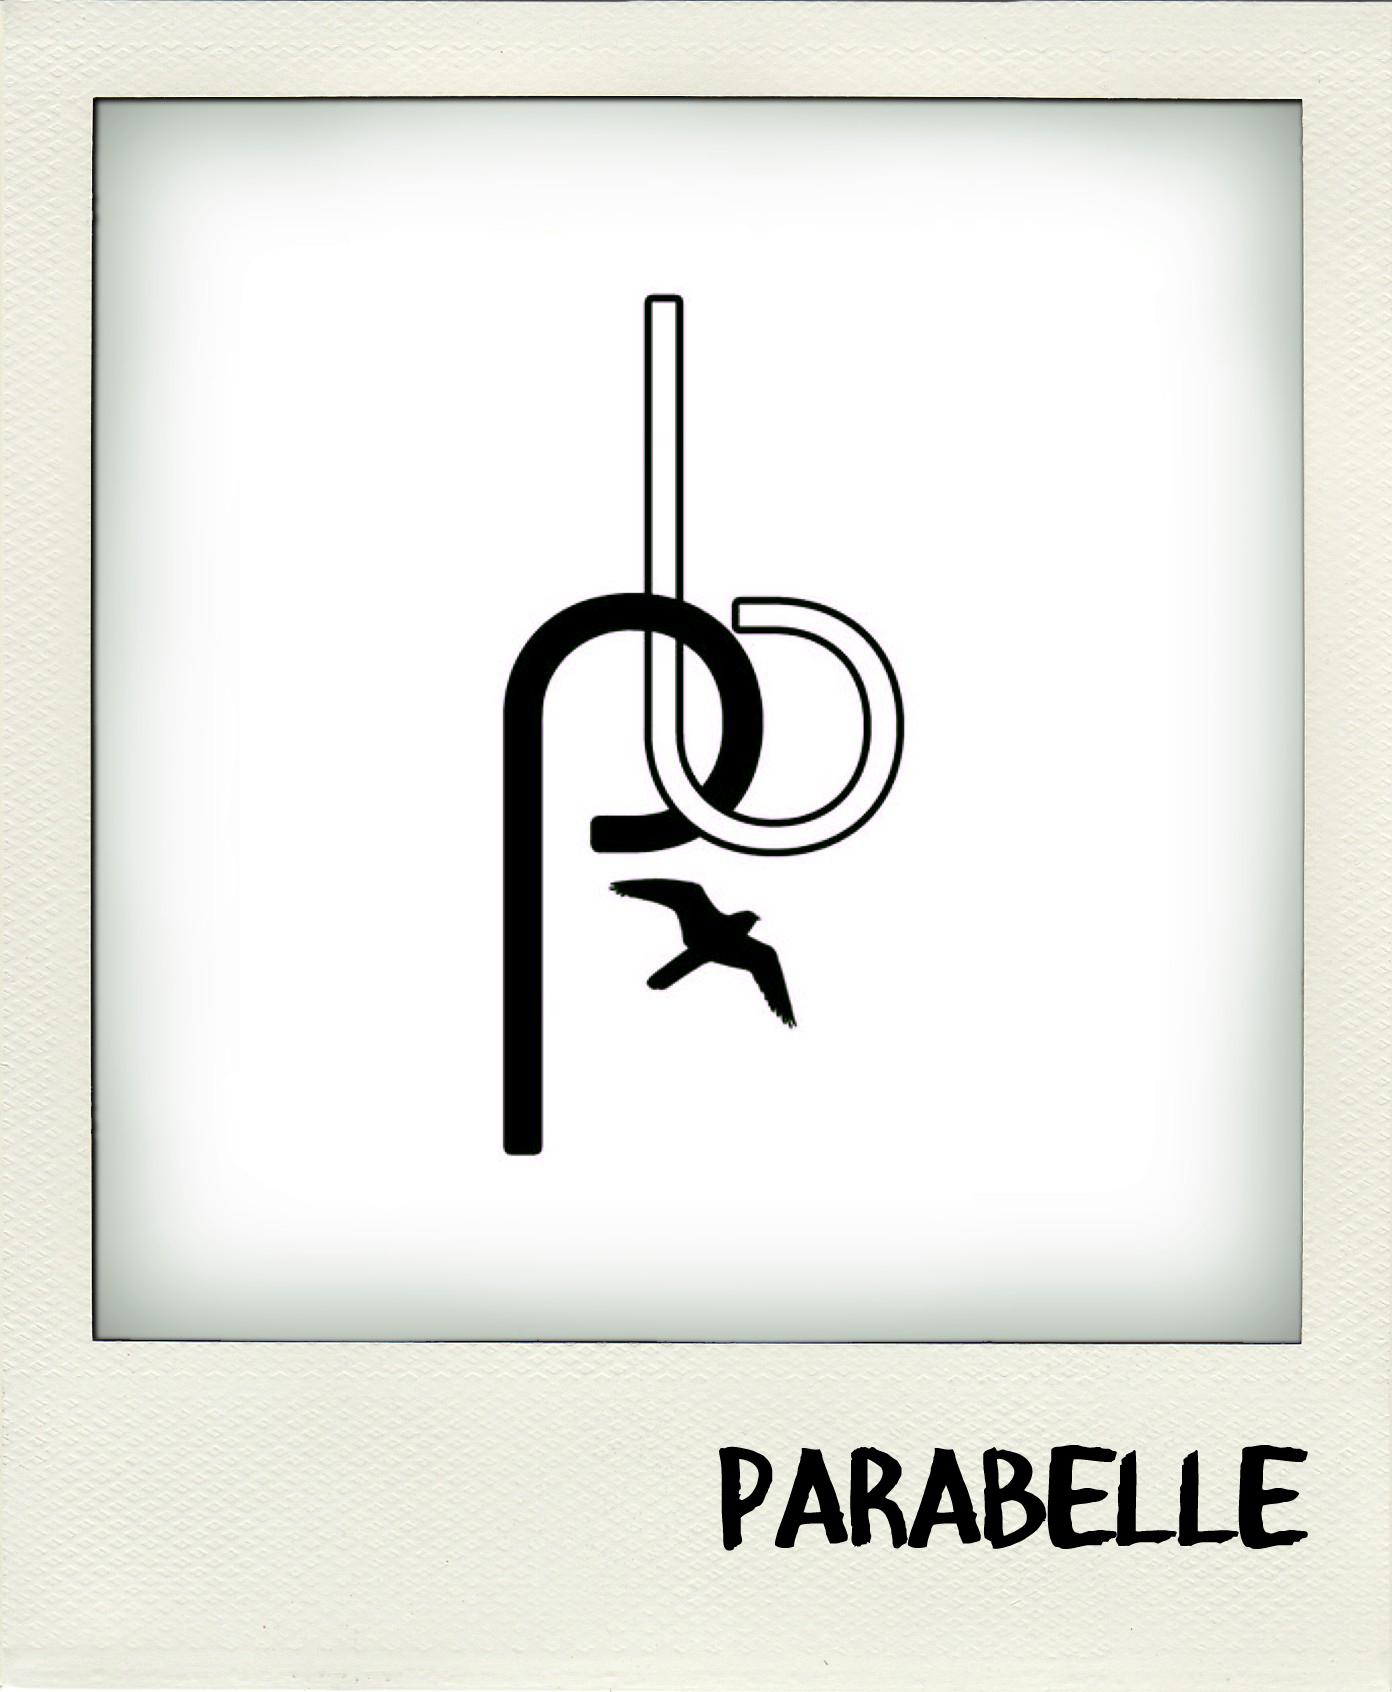 Parabelle Pops